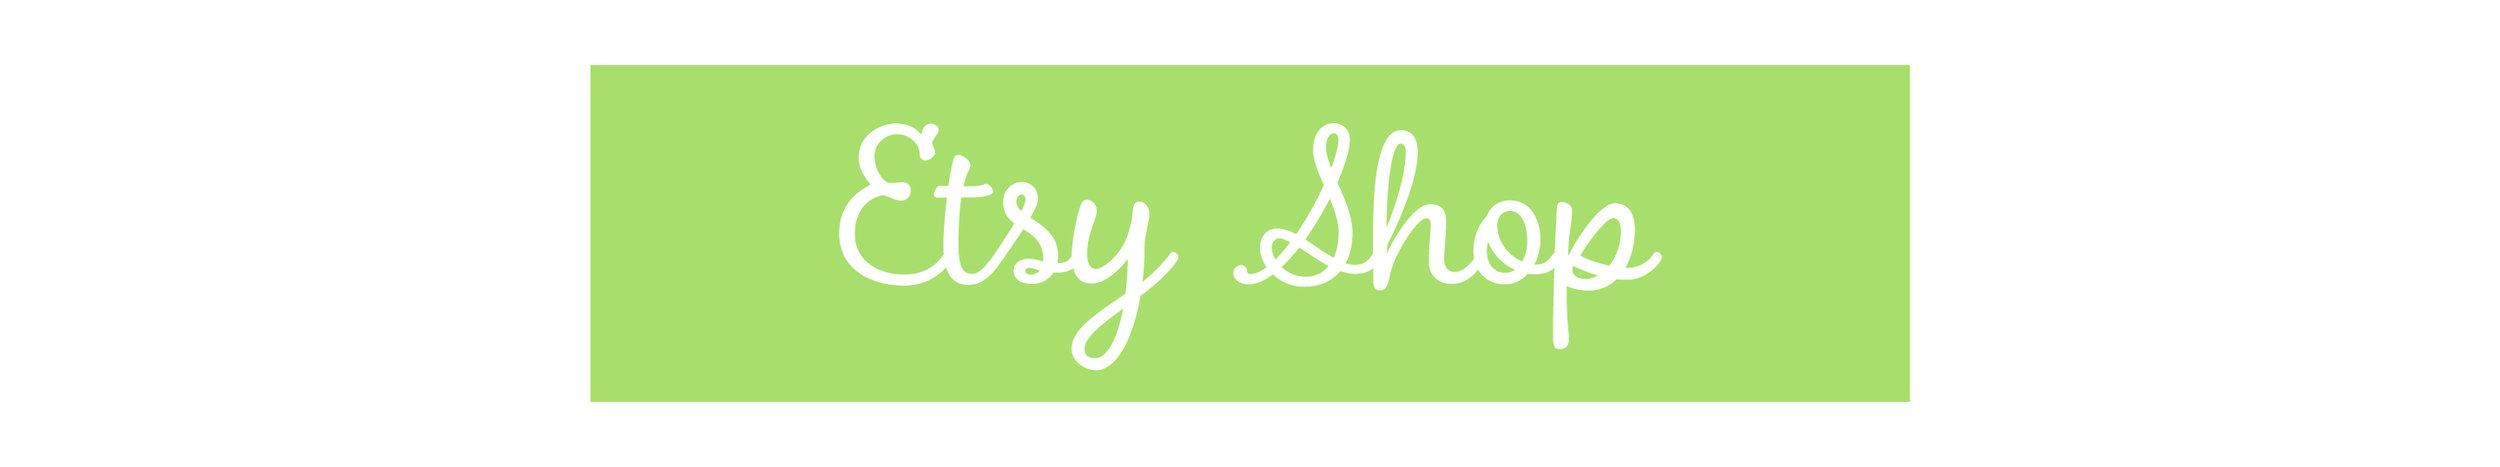 Website_Buttons_Etsy_Shop.jpg